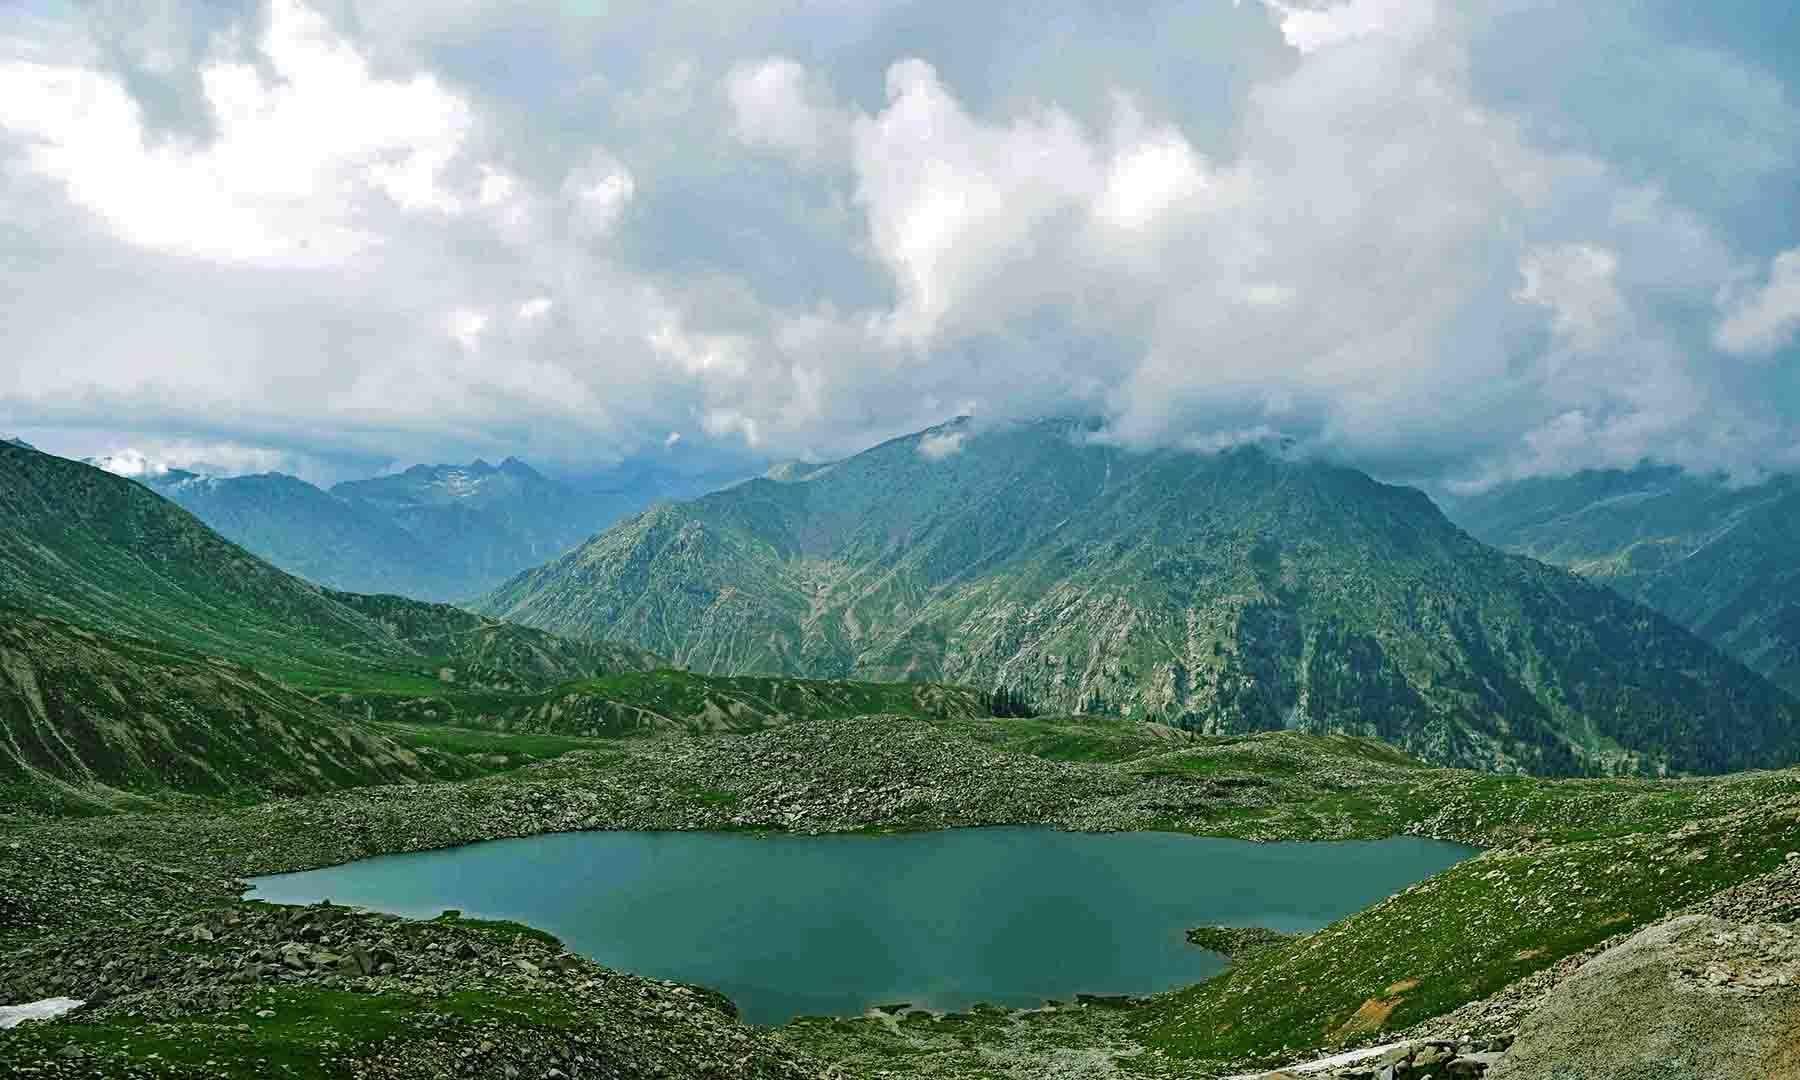 سطح سمندر سے 11 ہزار 500 فٹ بلندی پر واقع درال جھیل— امجد سیماب